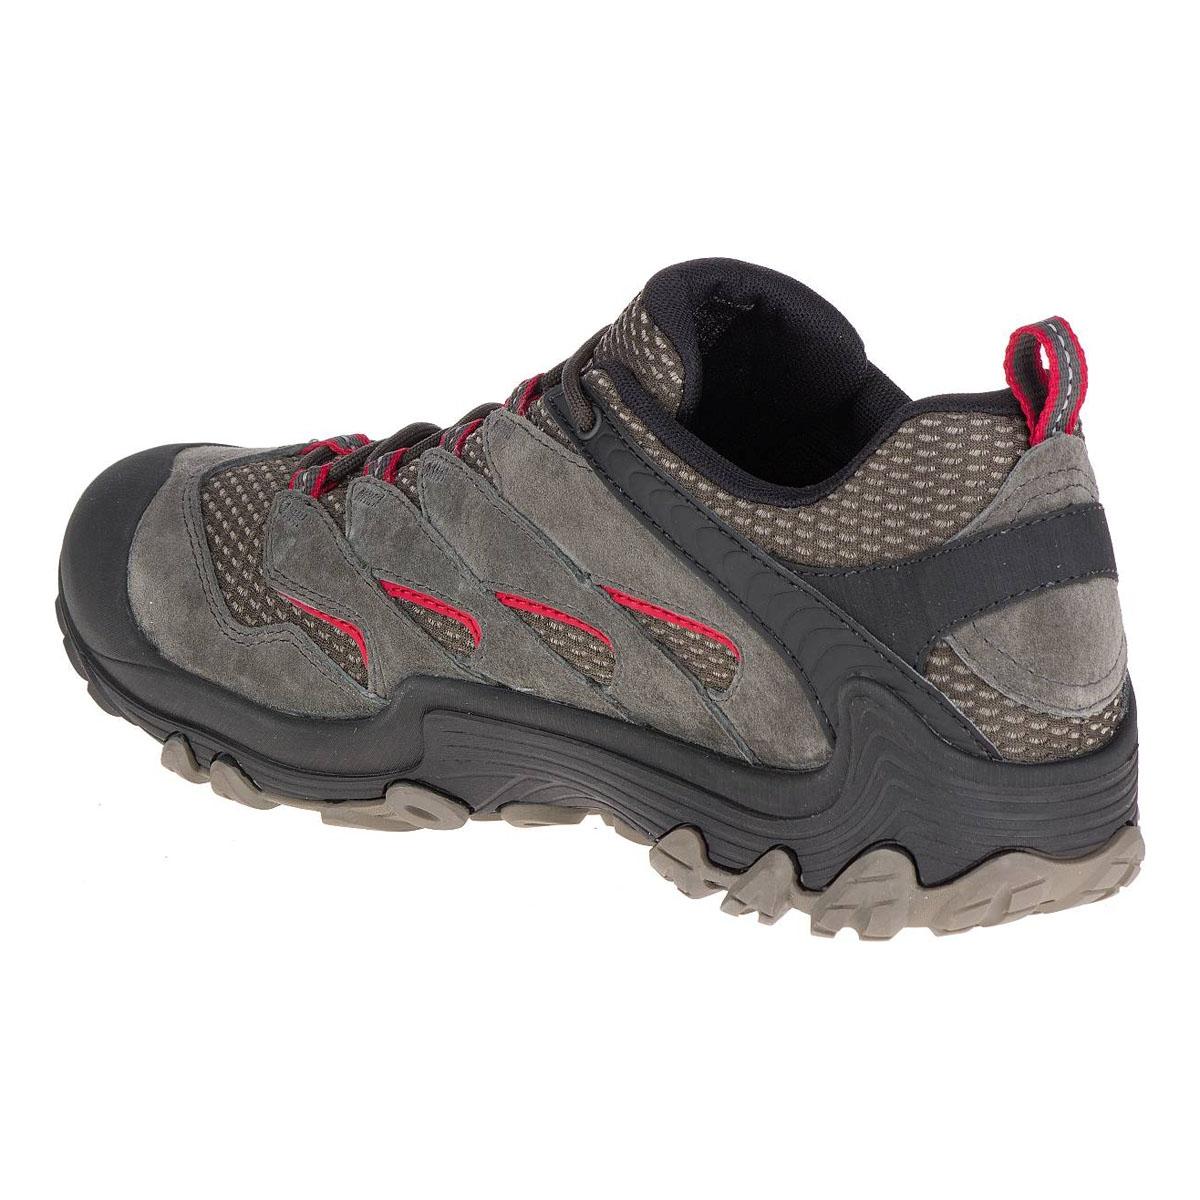 50c2498717f ... Image of Merrell Chameleon 7 Limit Waterproof Walking Shoes (Men's) -  Beluga ...